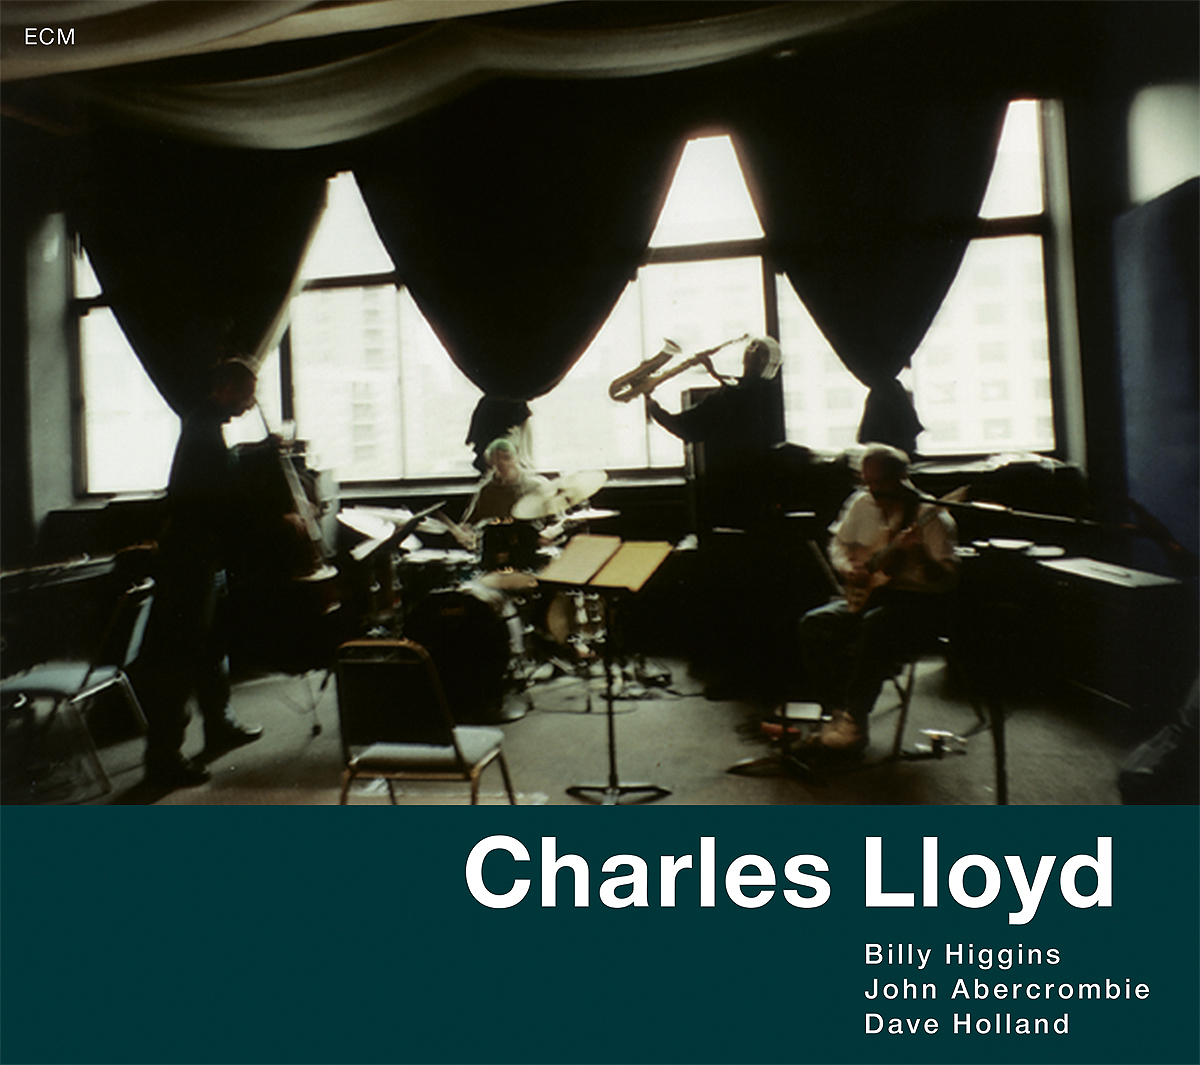 лучшая цена Чарльз Ллойд,Джон Аберкромби,Дэйв Холланд,Билли Хиггинс Charles Lloyd. Voice In The Night (2 LP)